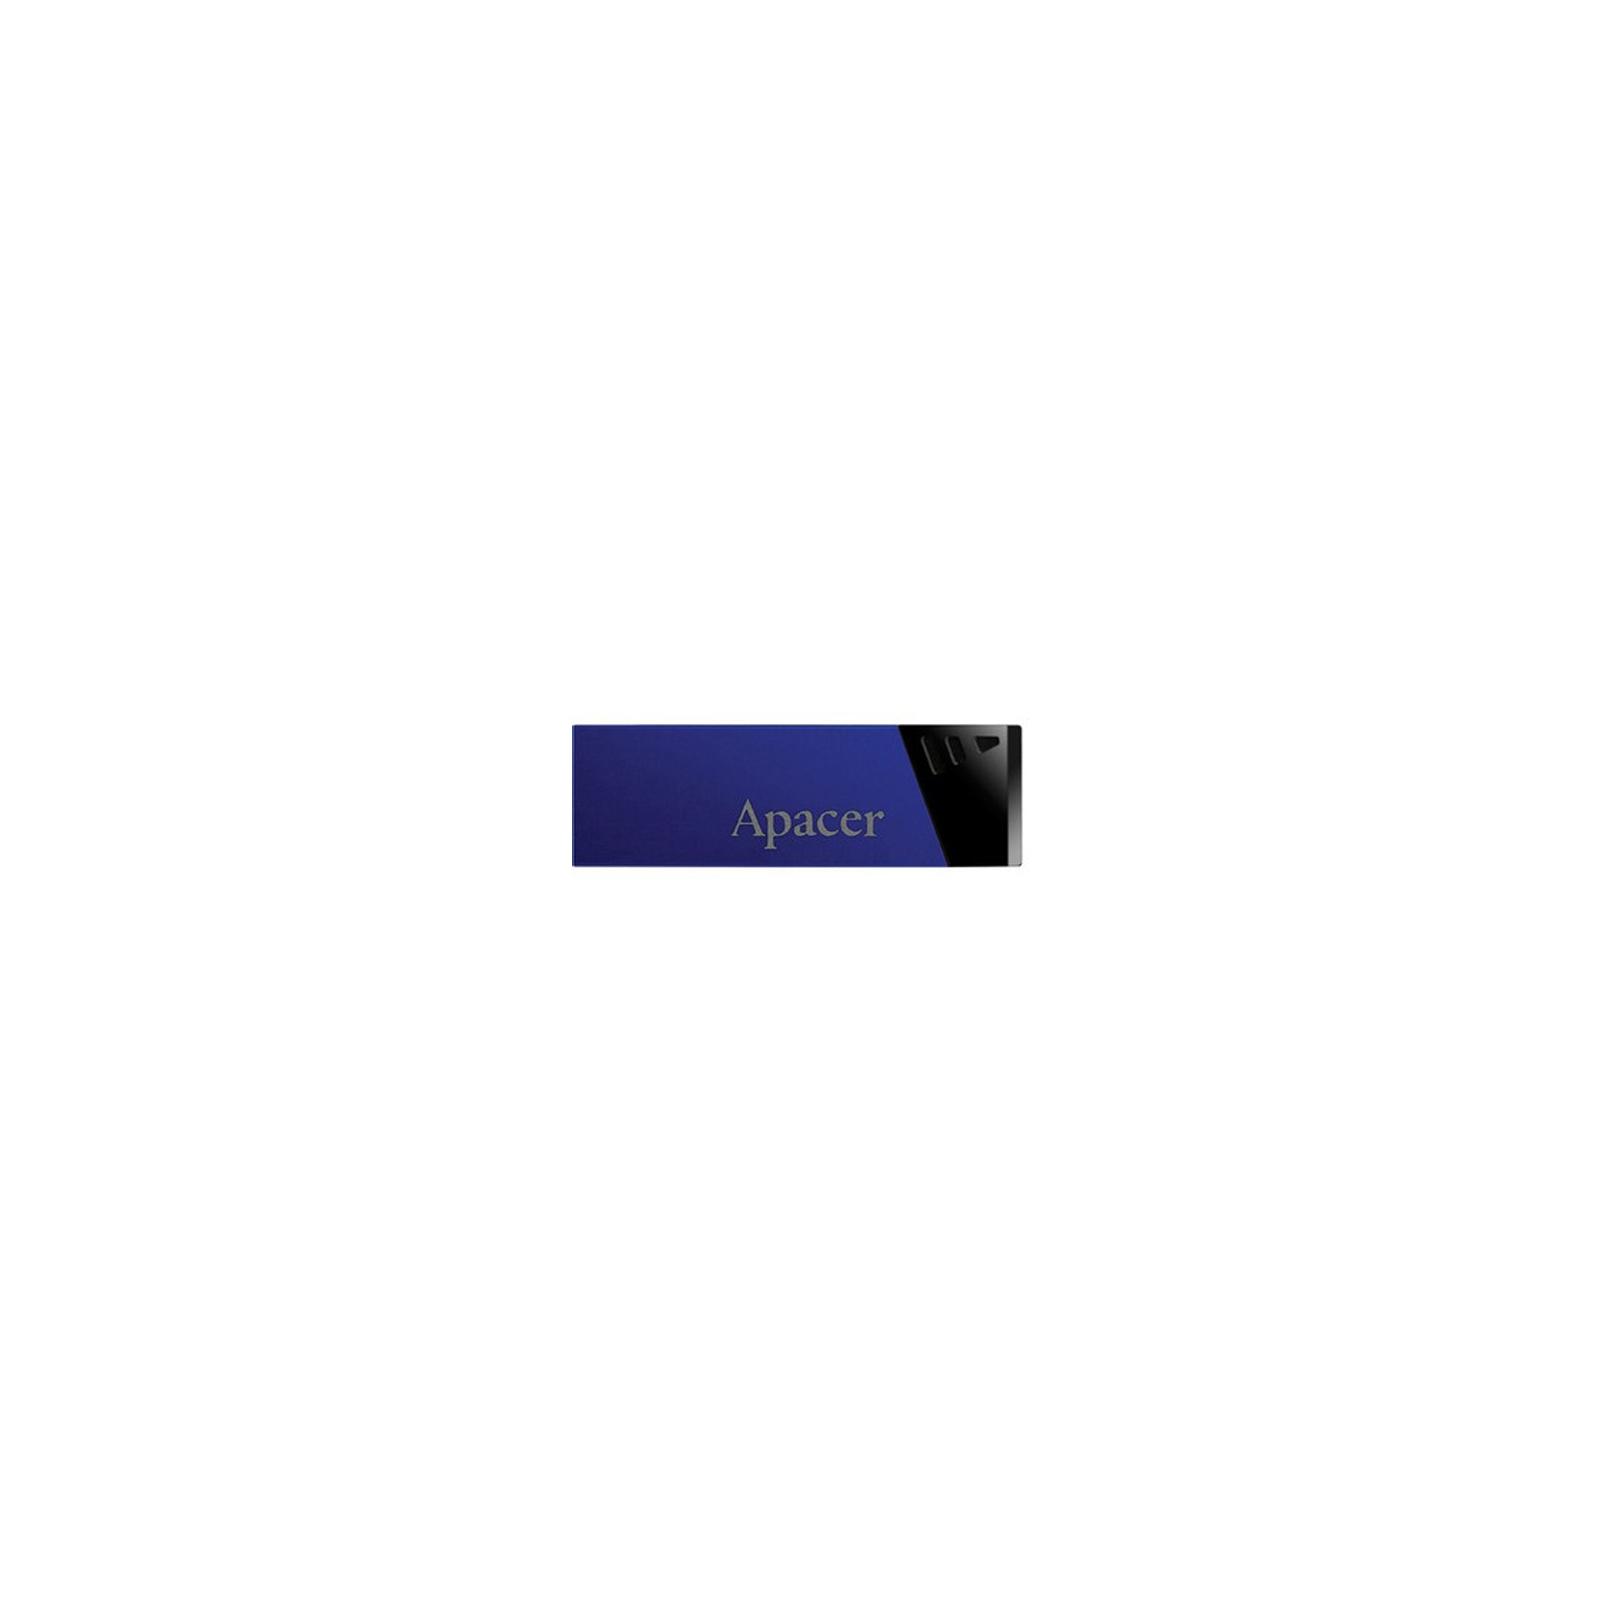 USB флеш накопитель 32GB AH131 Blue RP USB2.0 Apacer (AP32GAH131U-1)